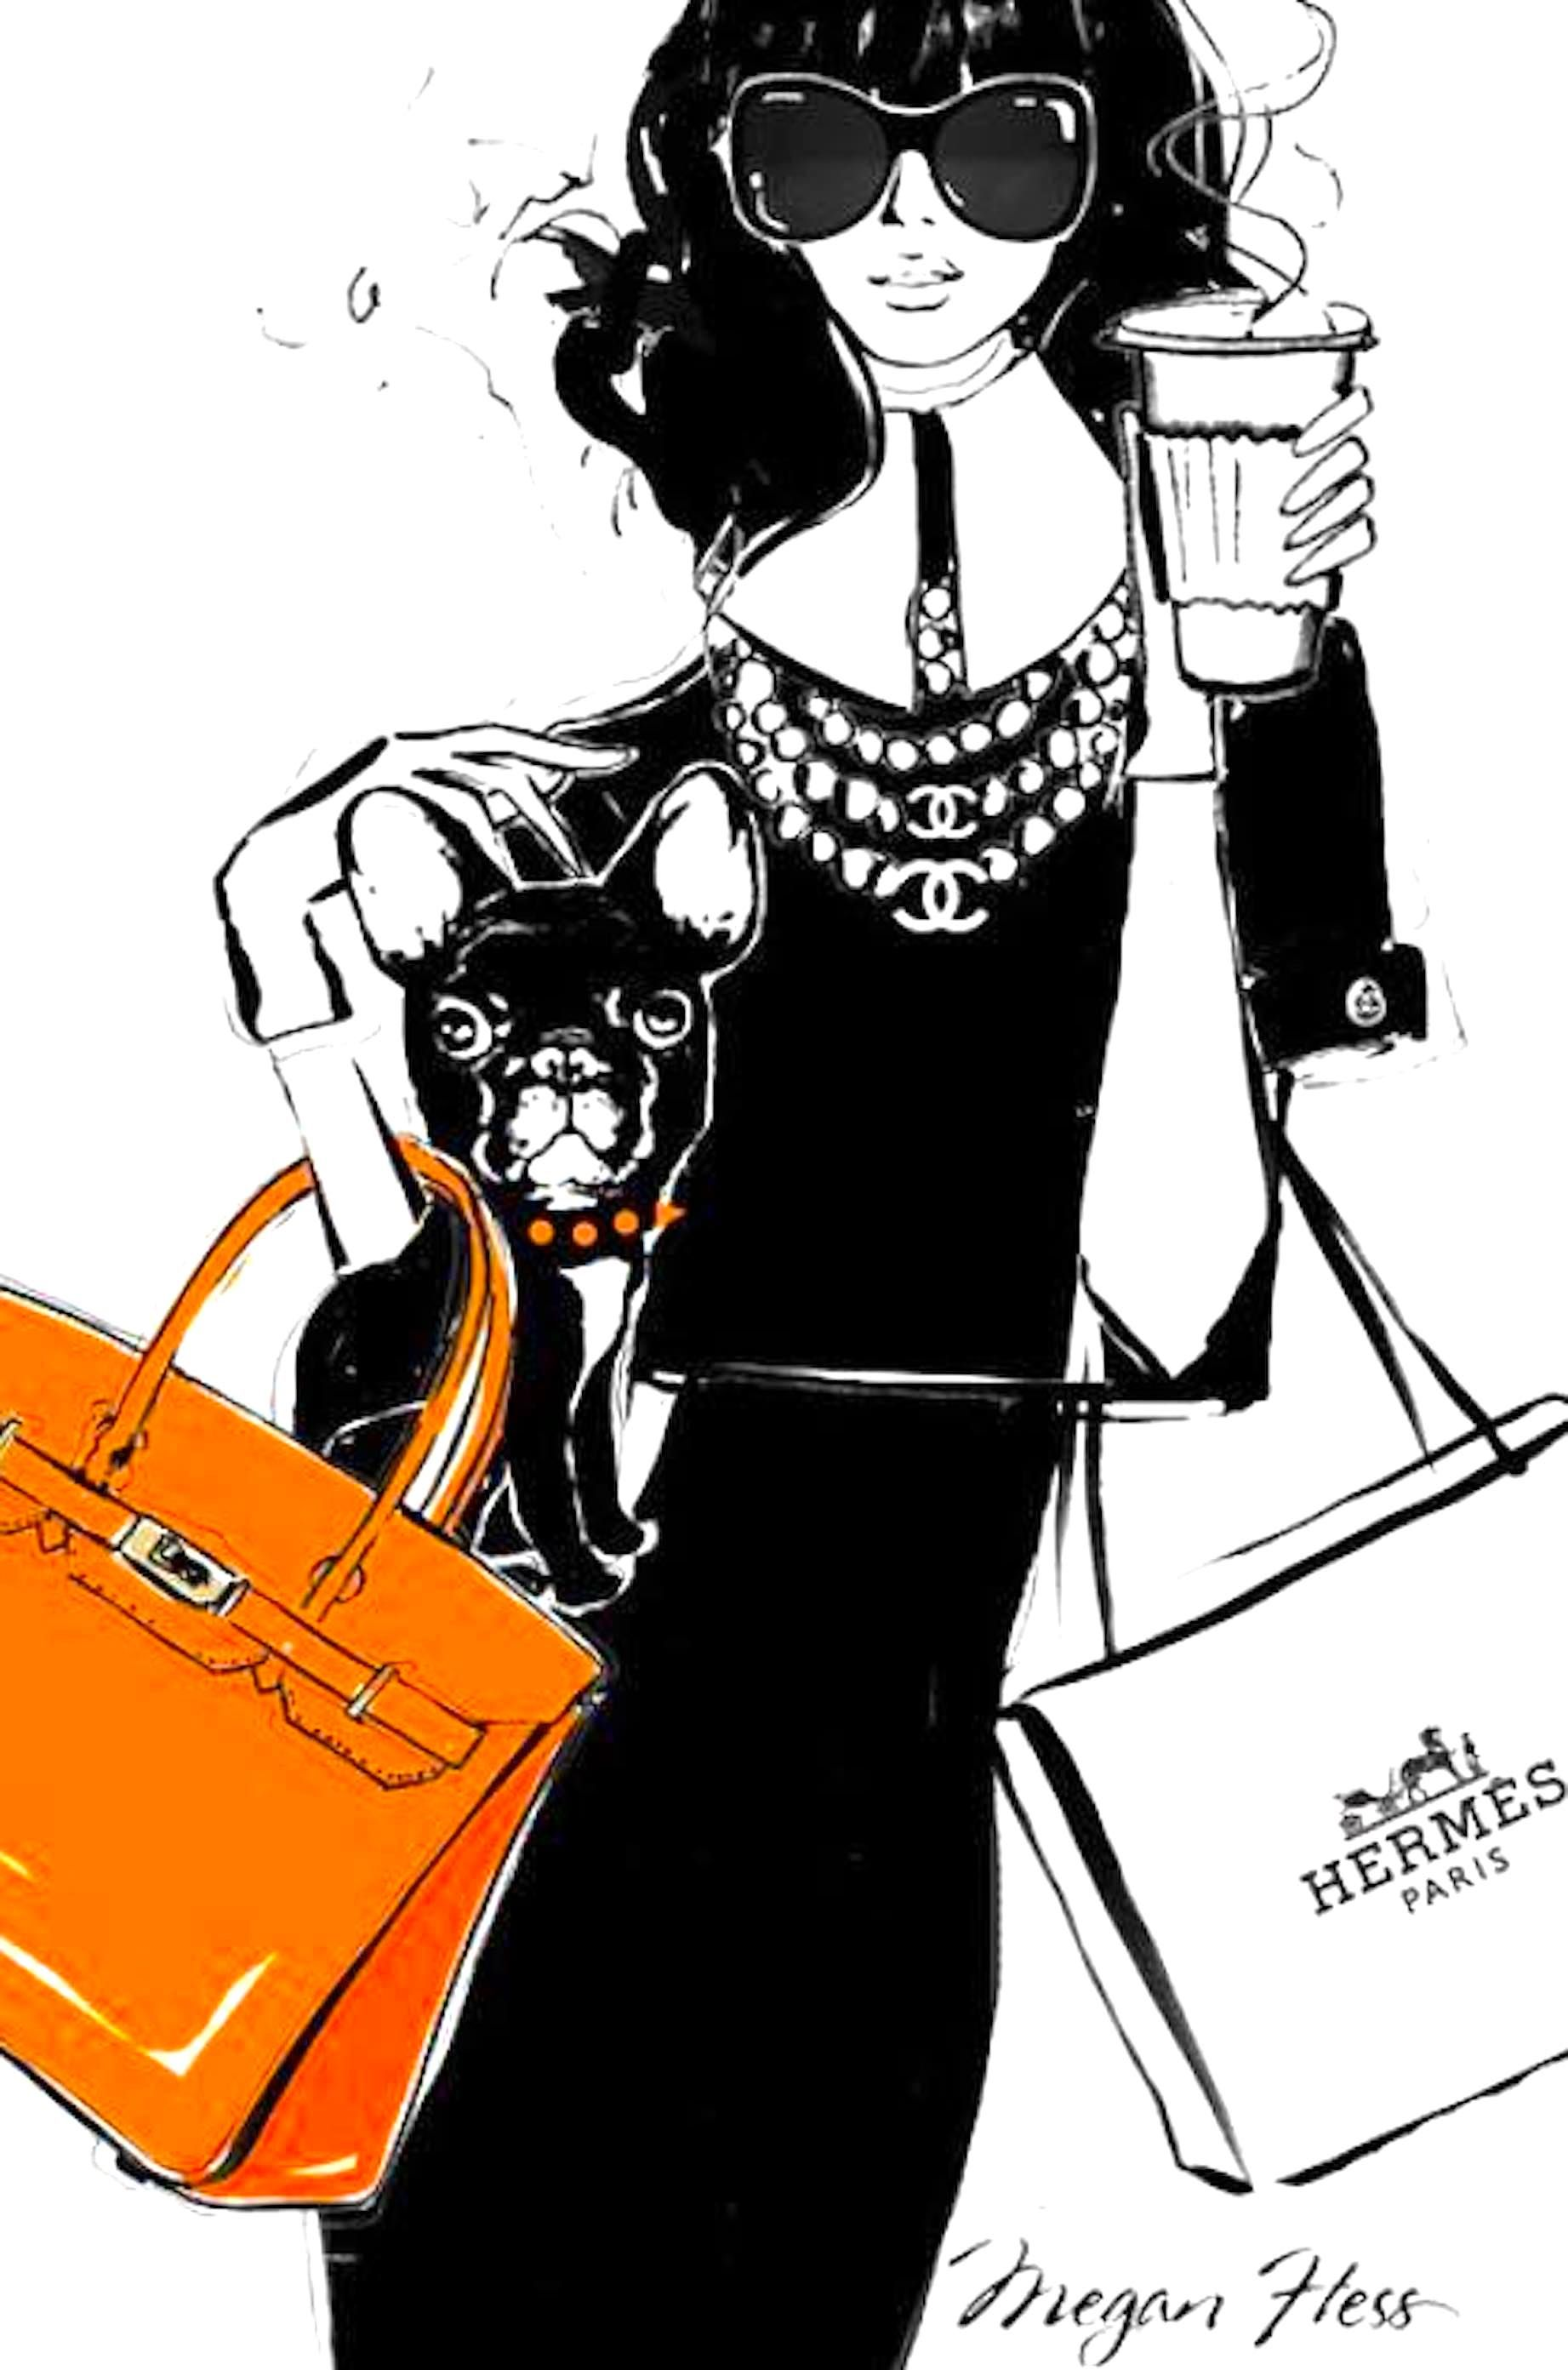 Megan Hess Megan hess, Megan hess illustration, Fashion